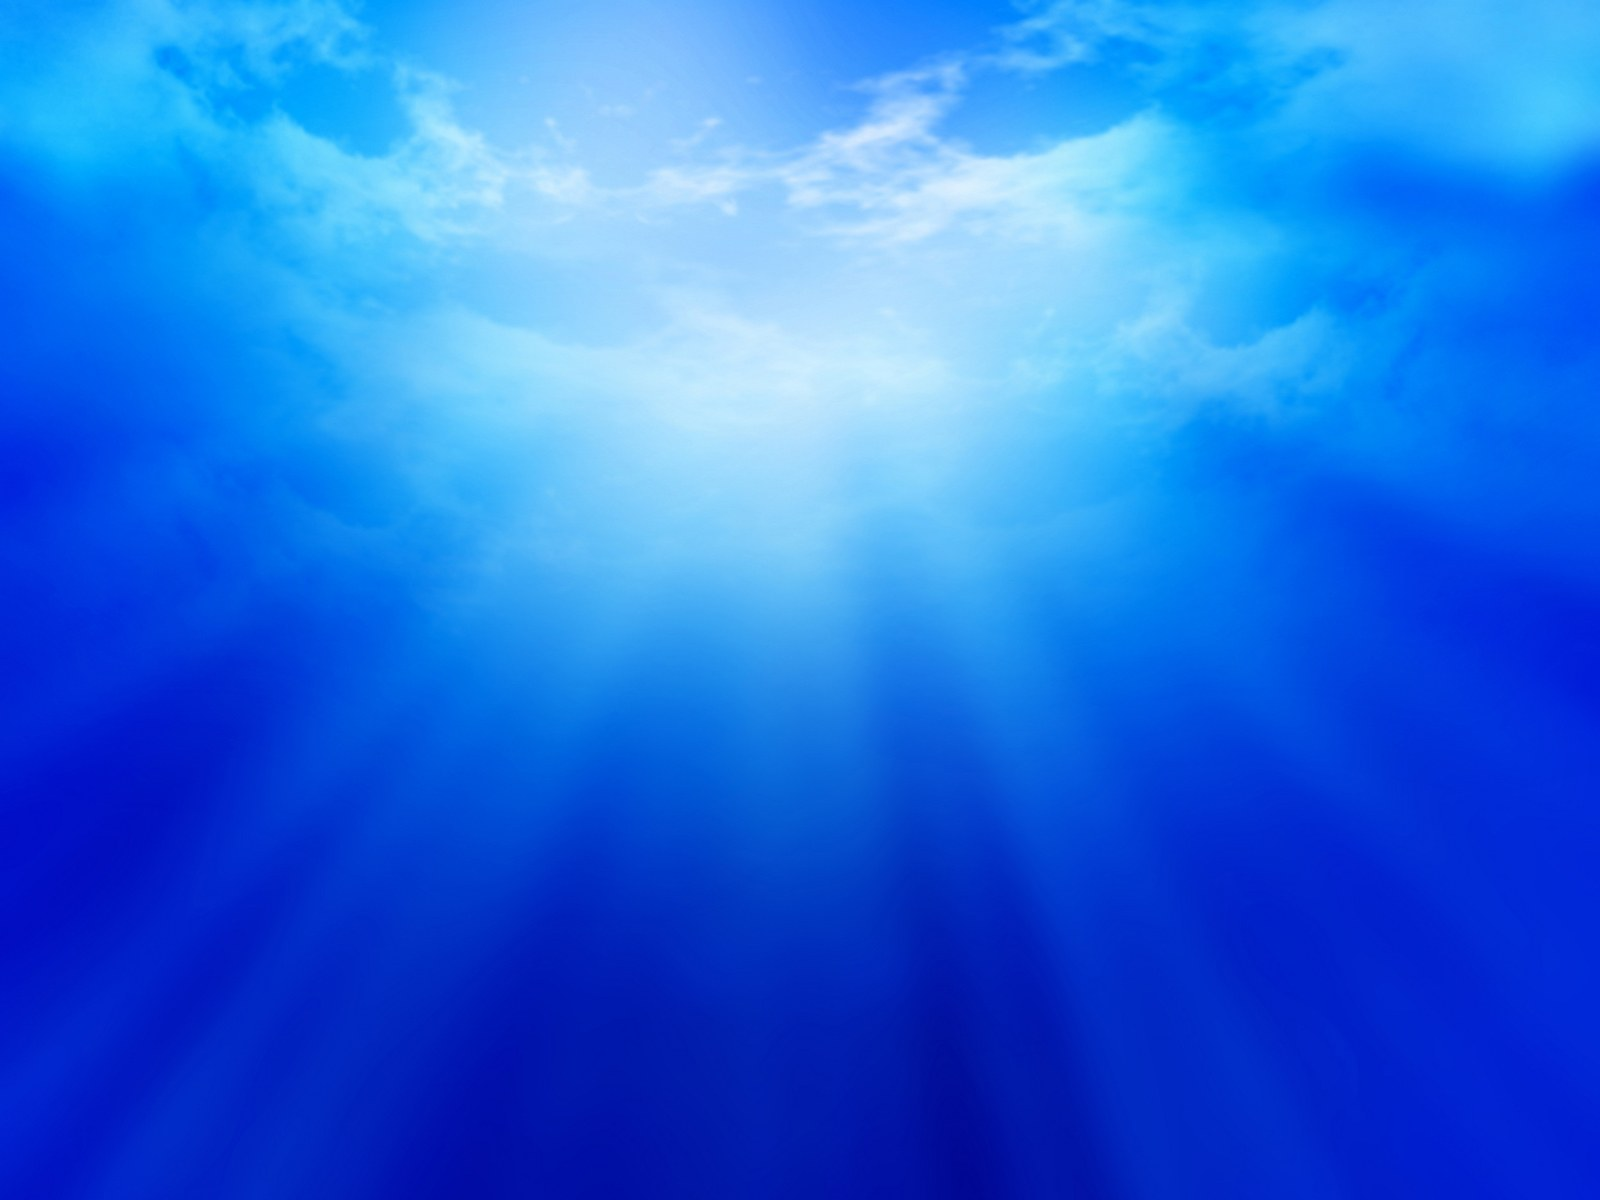 top desktop blue wallpapers blue wallpaper blue background hd 5jpg 1600x1200